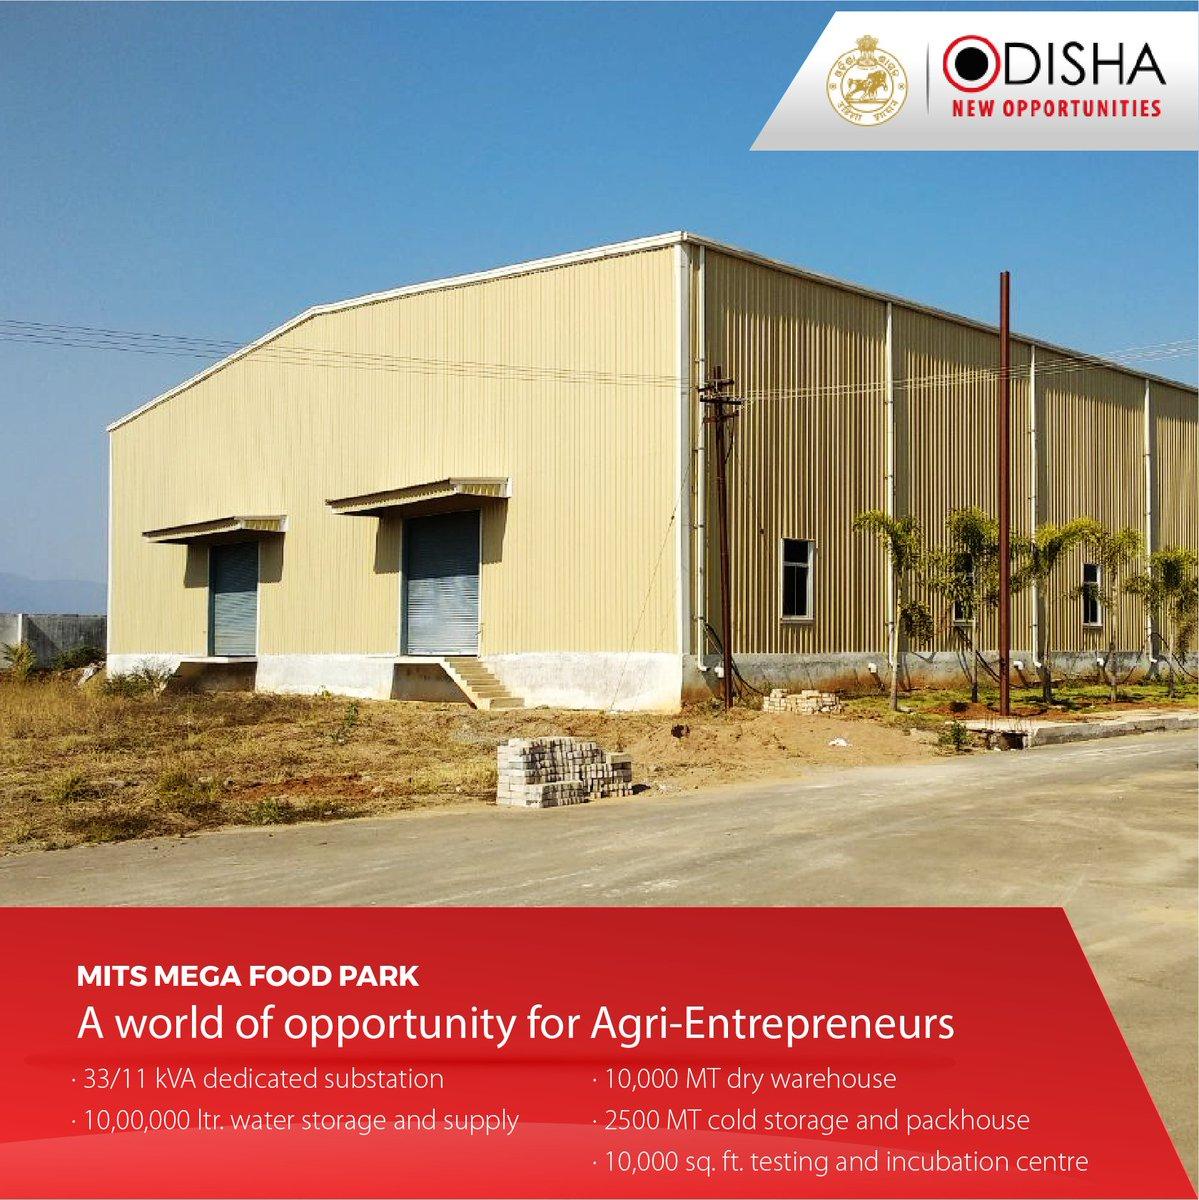 Invest Odisha on Twitter: